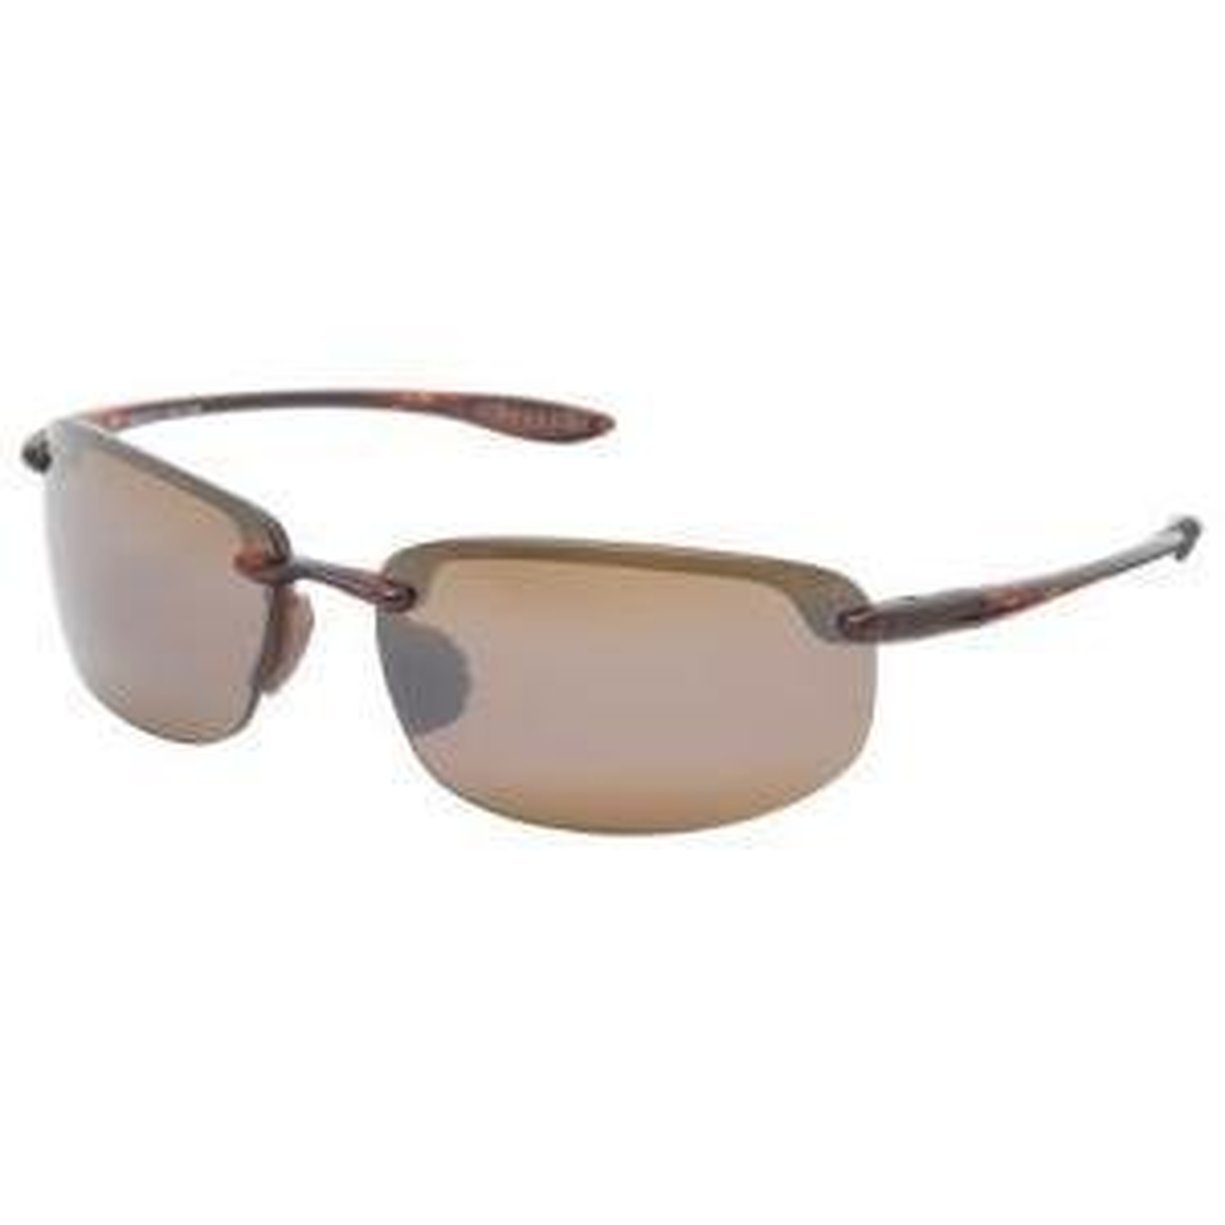 865cfc9d44 Maui Jim Hookipa MauiReaders Sunglasses - Polarized Tortoise/HCL Bronze,  1.50: Amazon.co.uk: Shoes & Bags